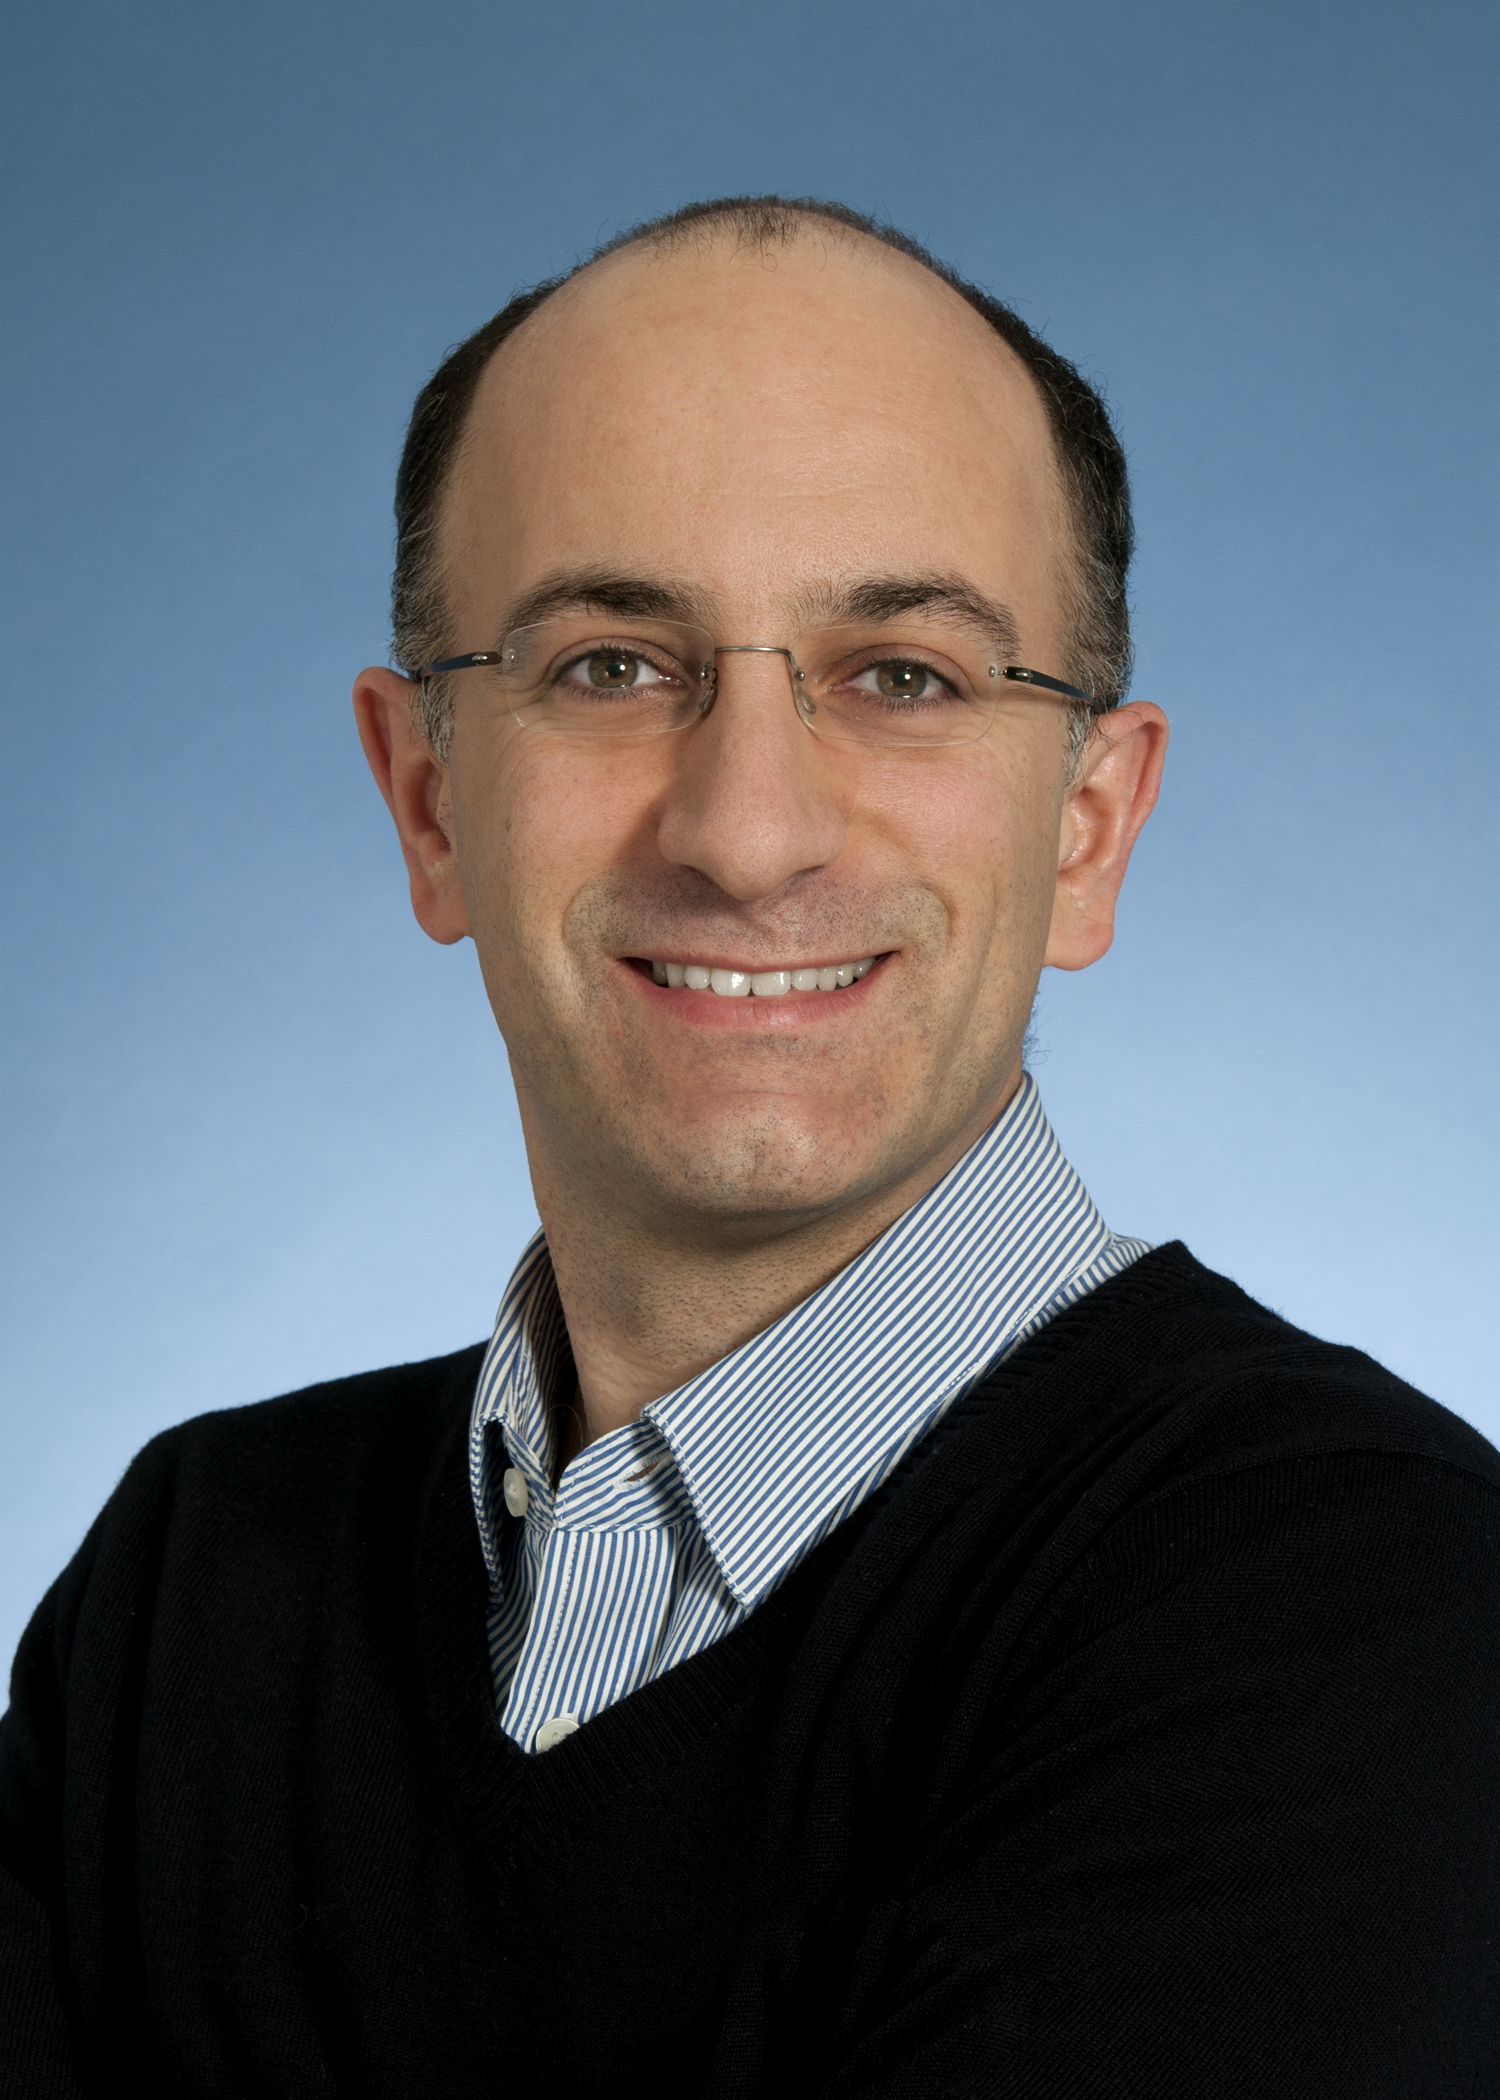 Associate Professor Anthony Michael Joshua